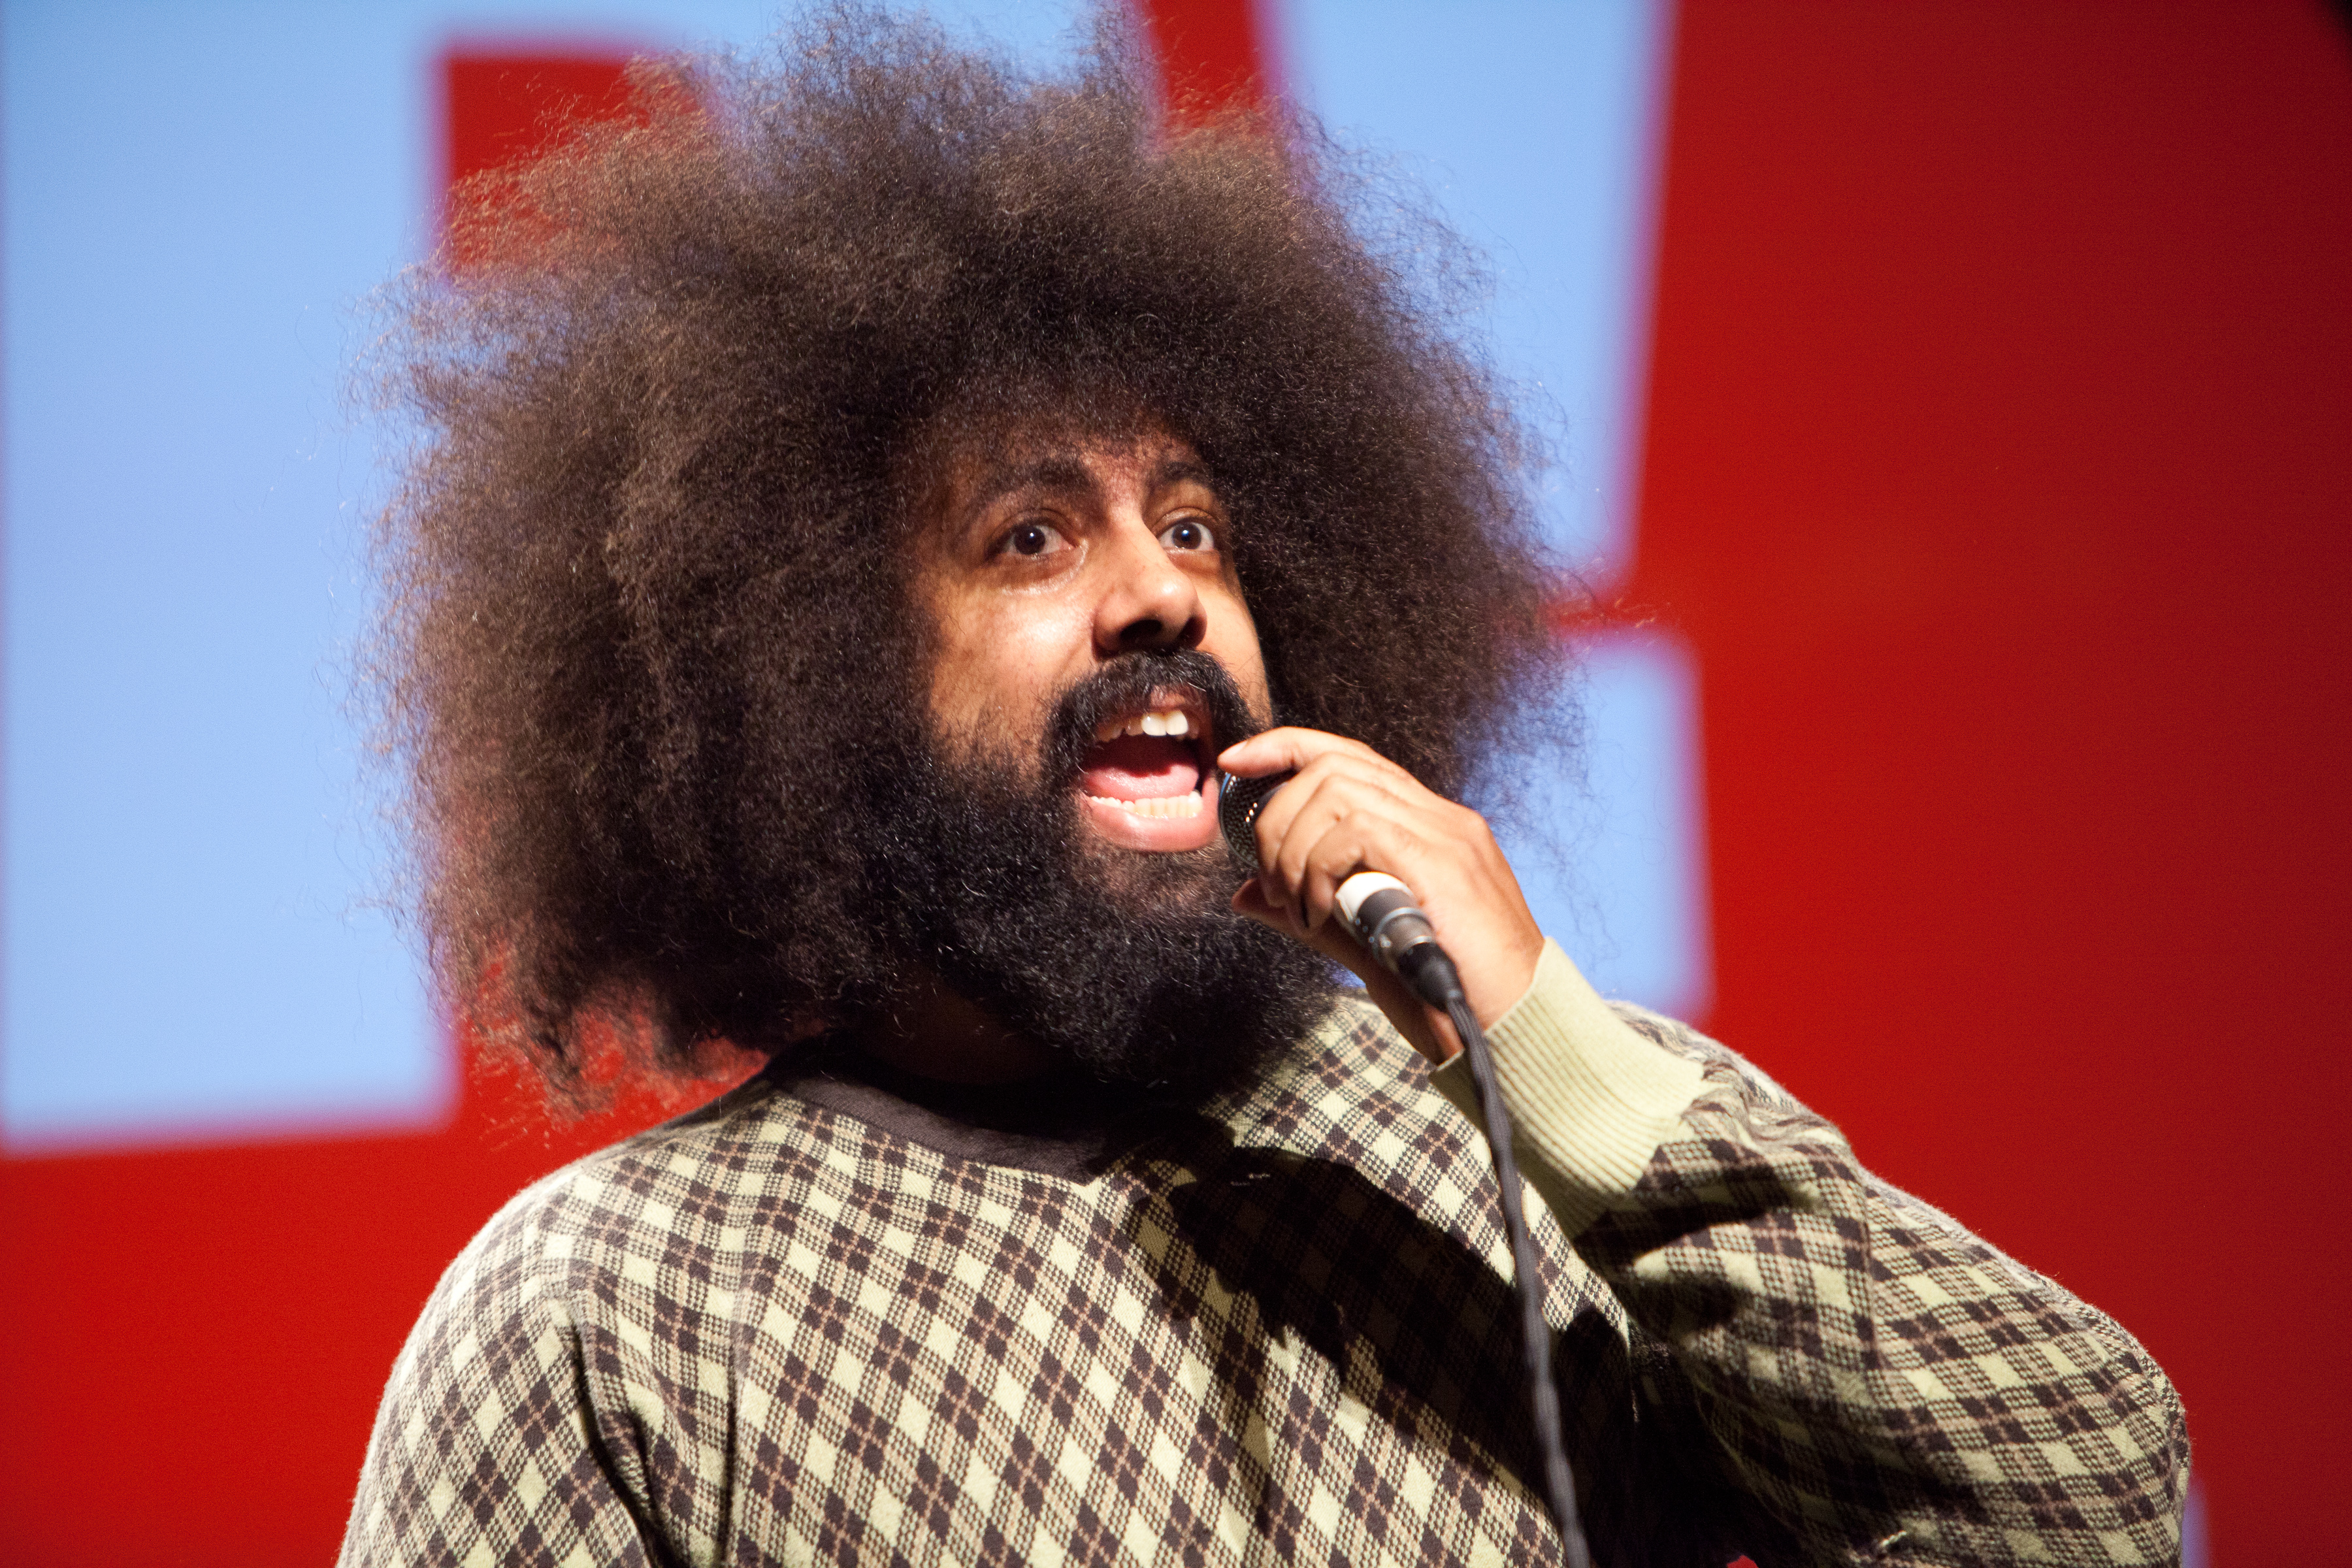 Portrait of Reggie Watts